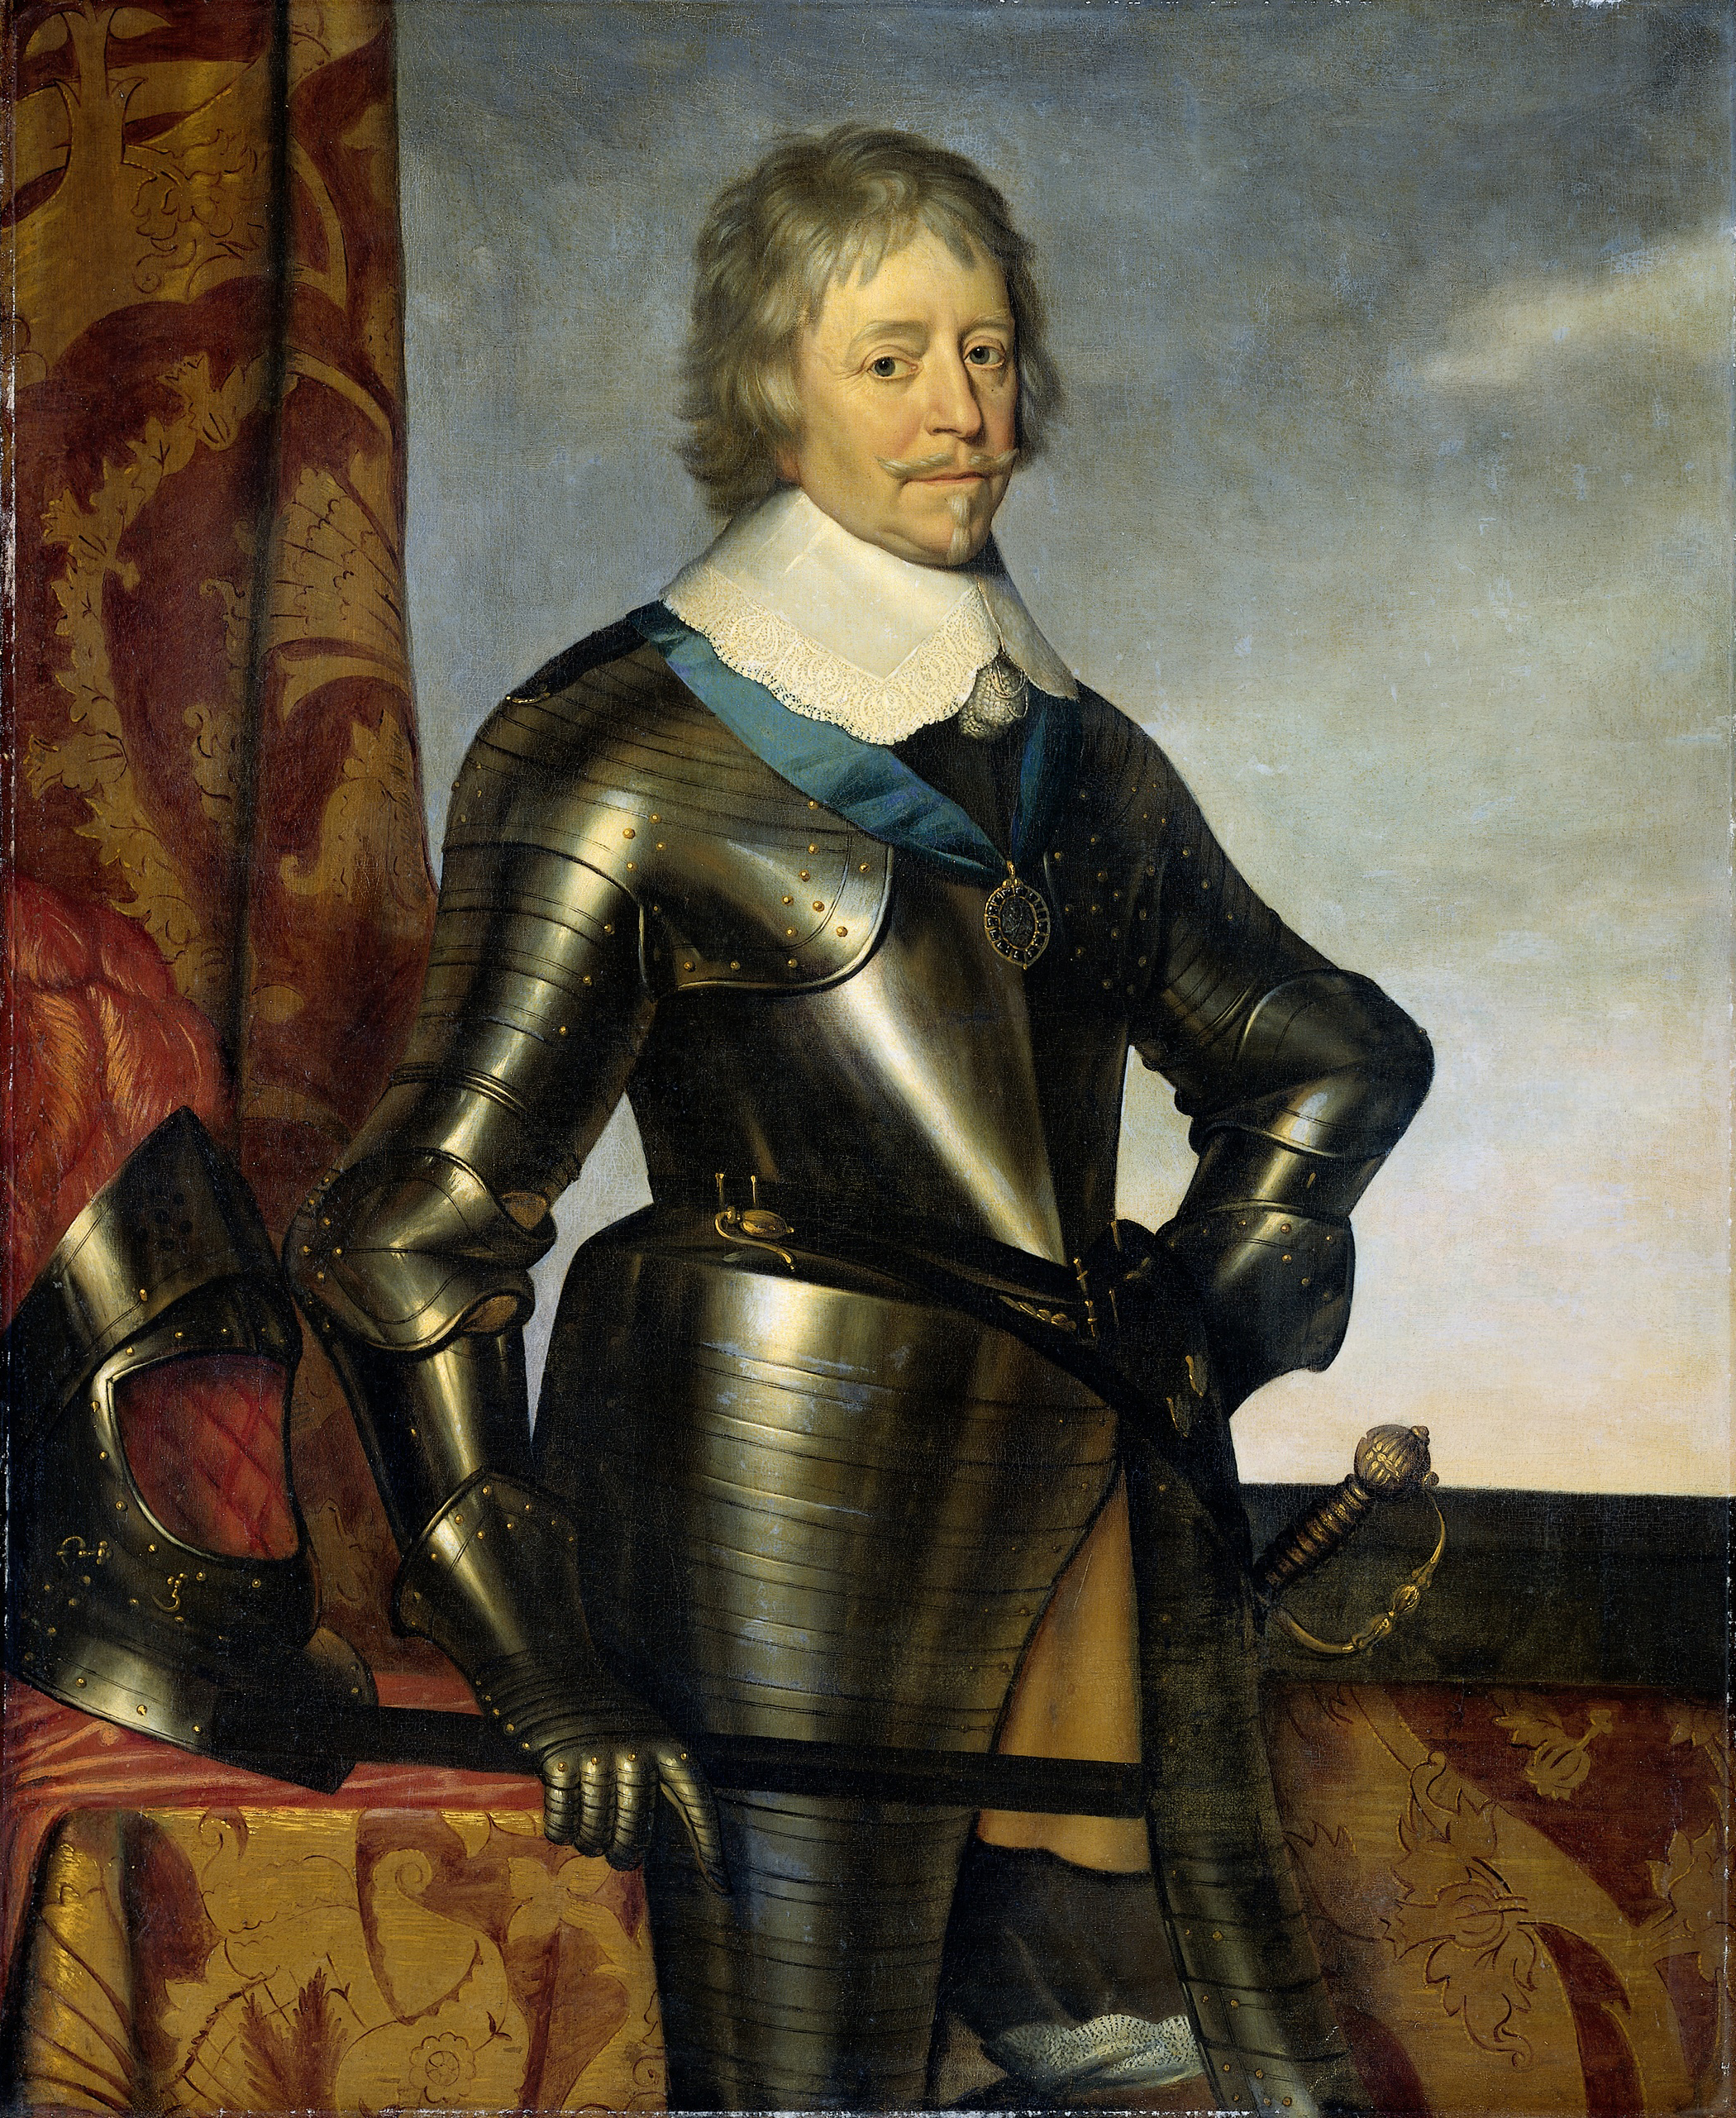 Bestandportret Van Frederik Hendrik 1584 1647 Prins Van